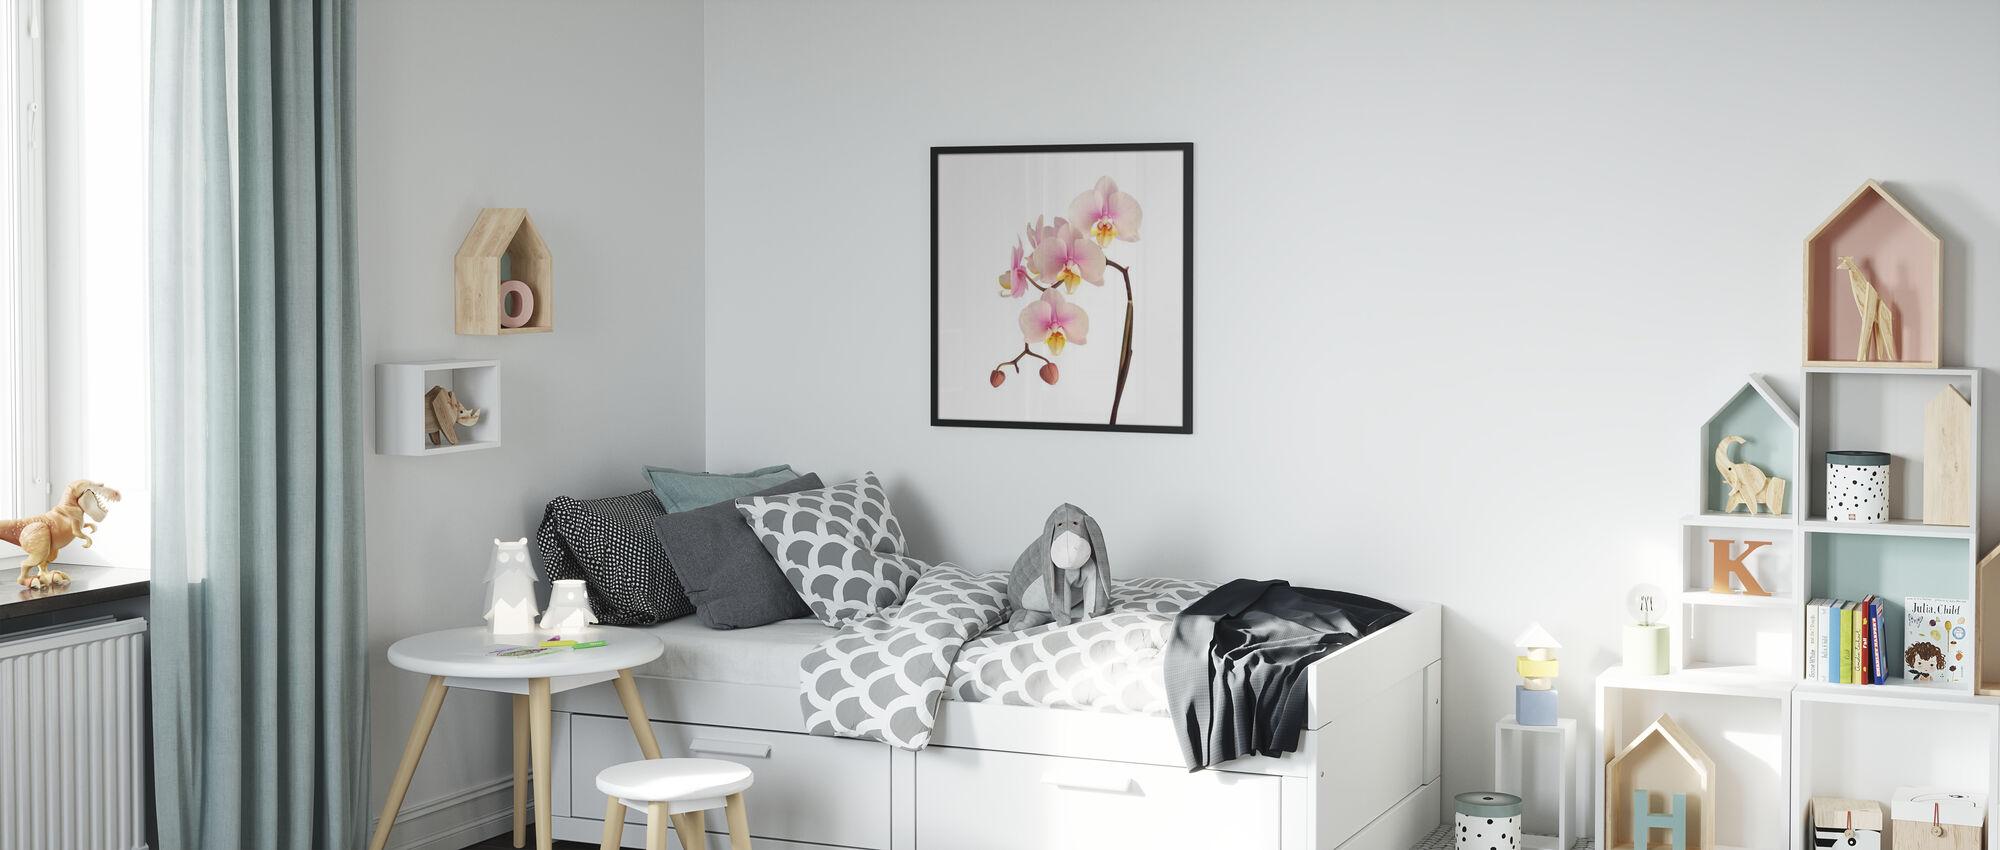 Rosa orkidé stam - Poster - Barnrum